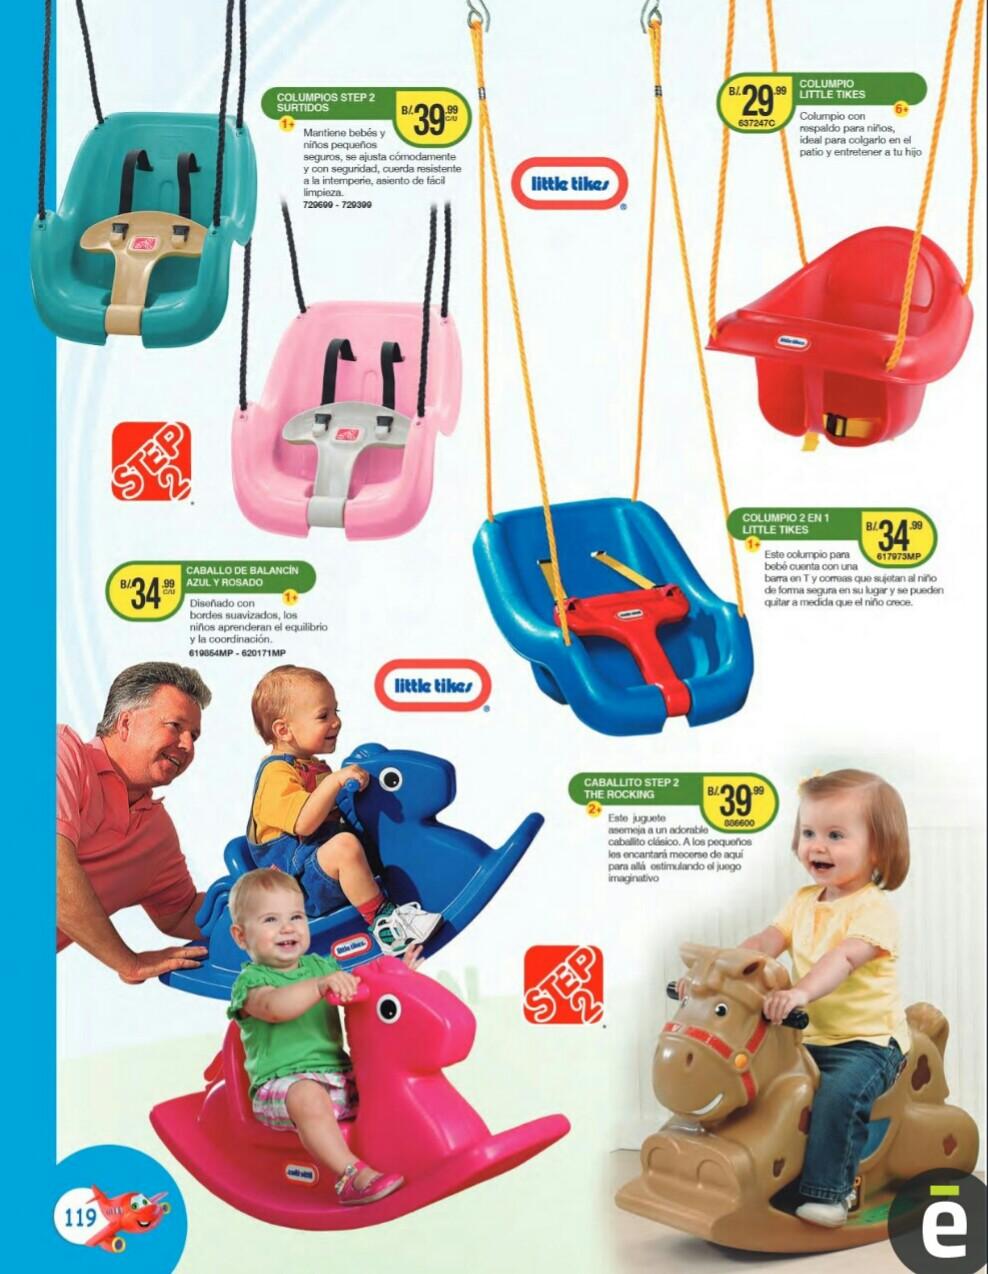 Catalogo juguetes Titan Toys 2019 p119